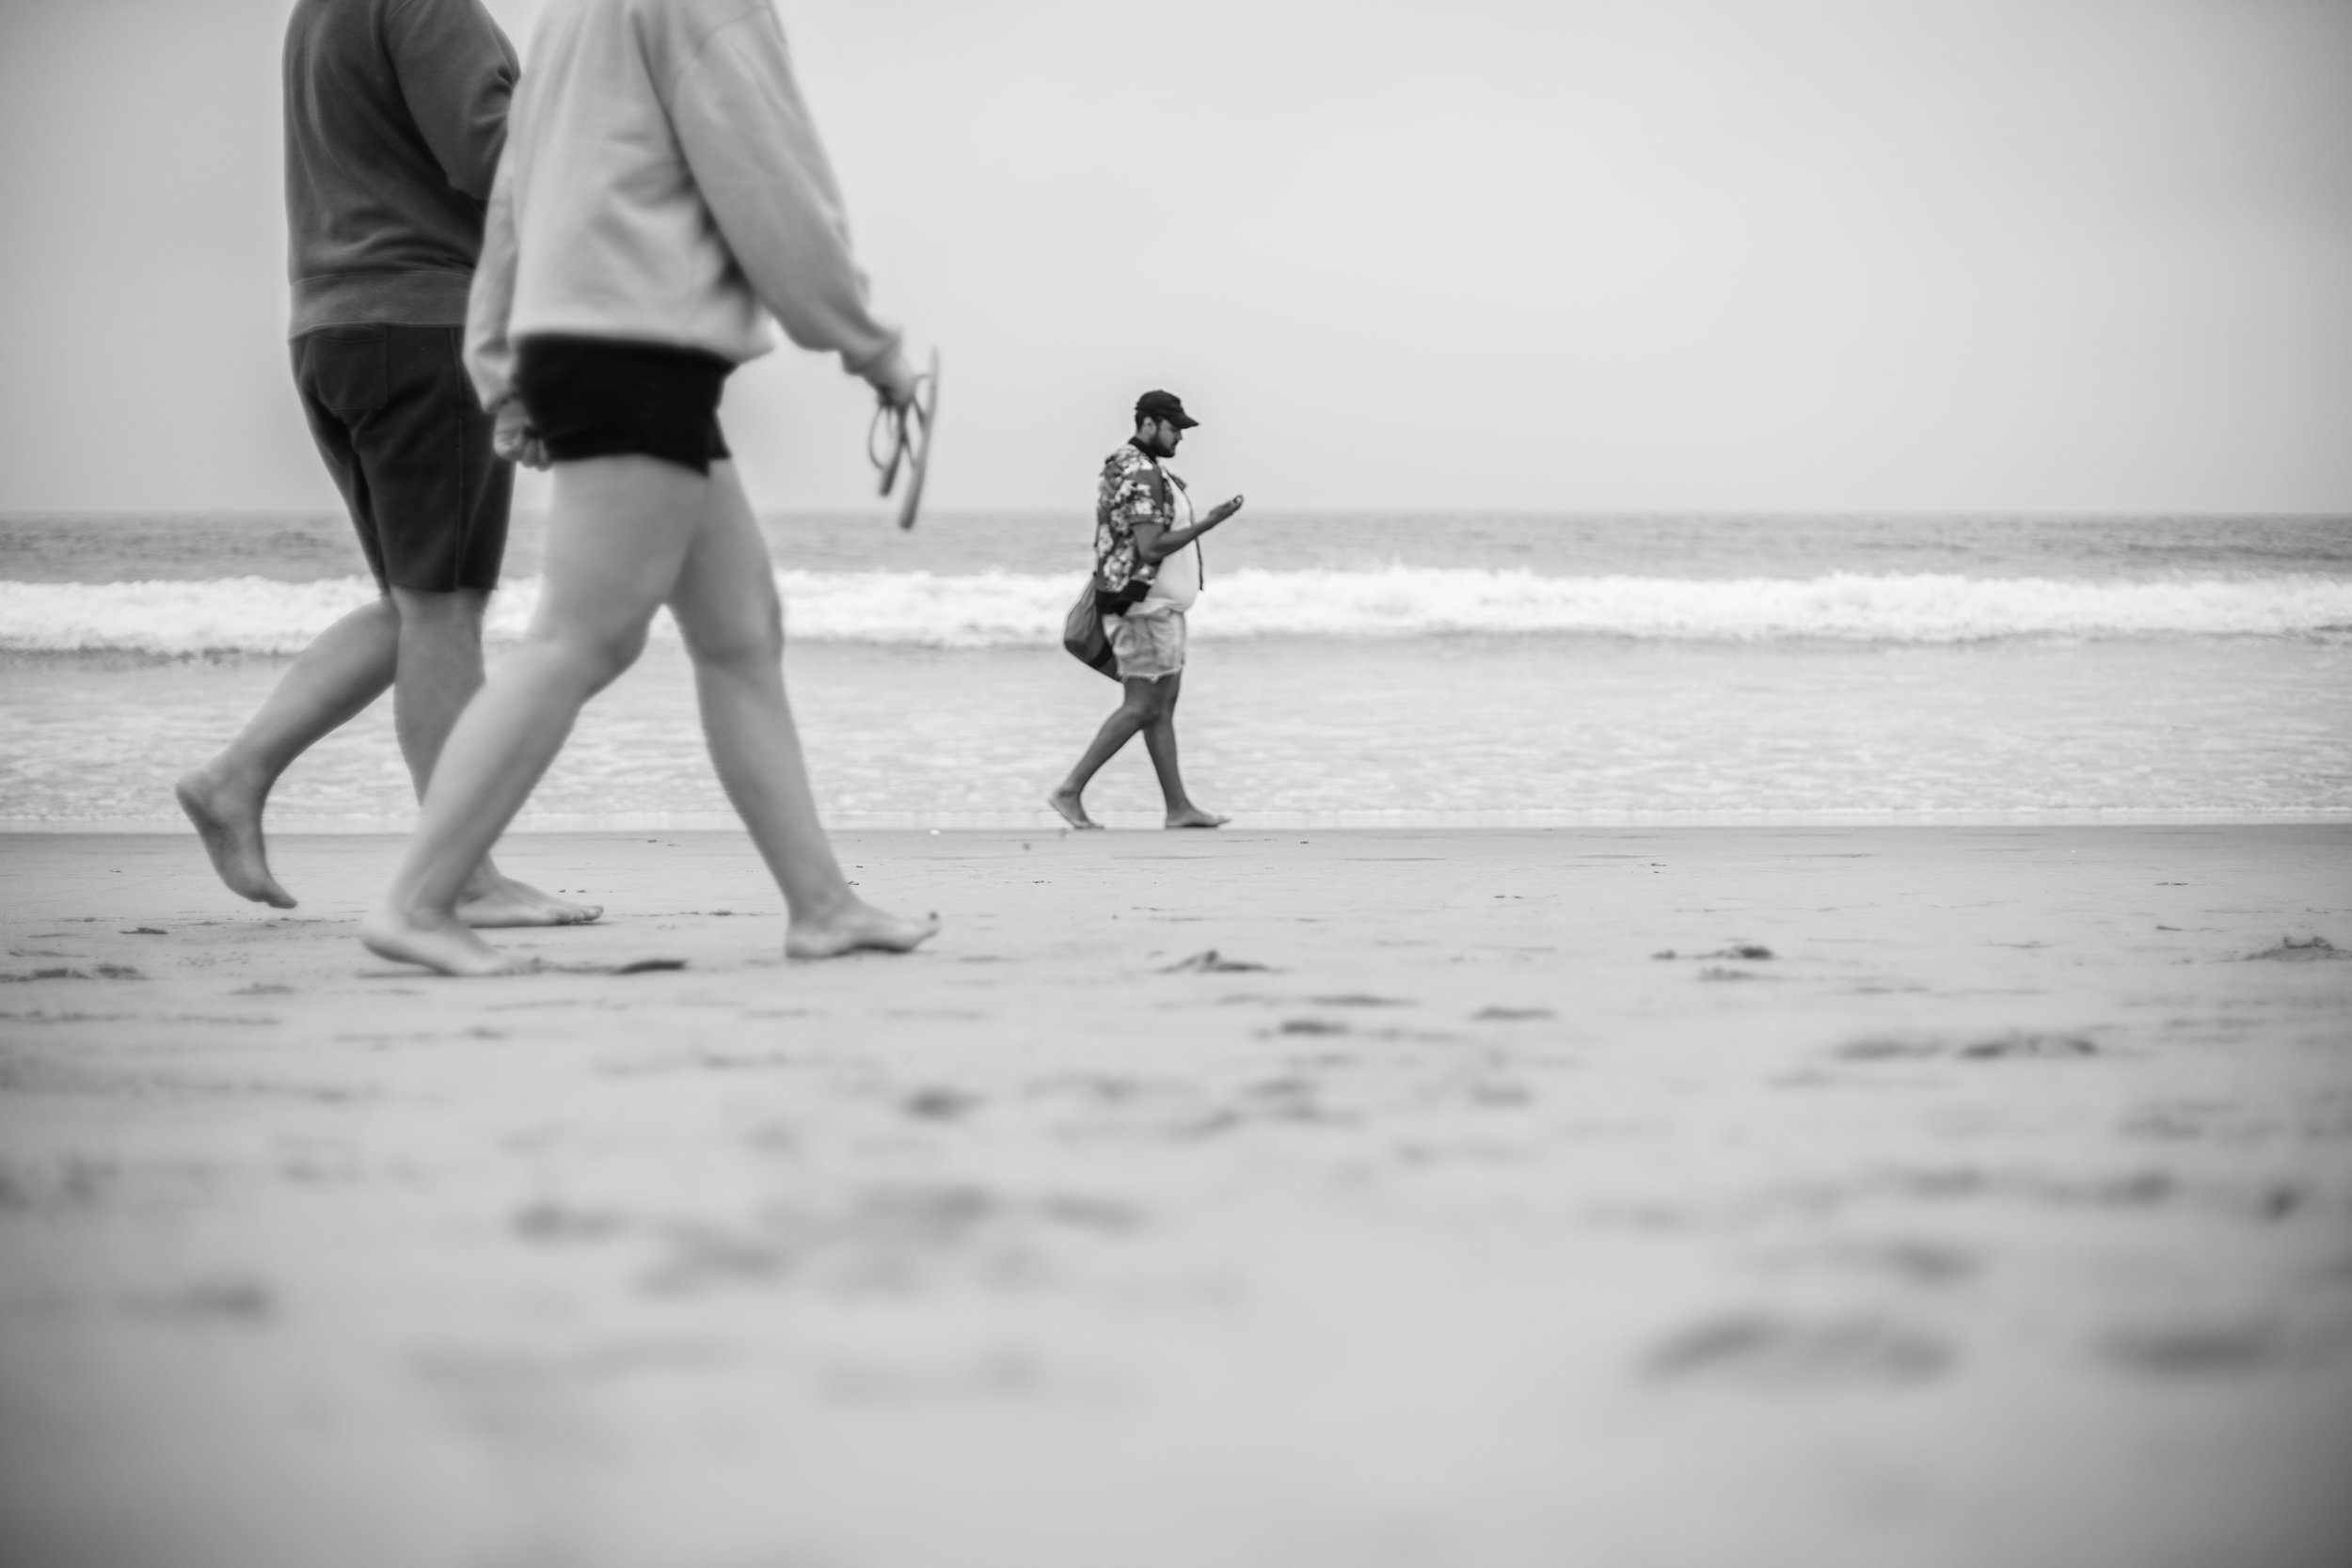 SM beach 20190808 (4 of 5).jpg